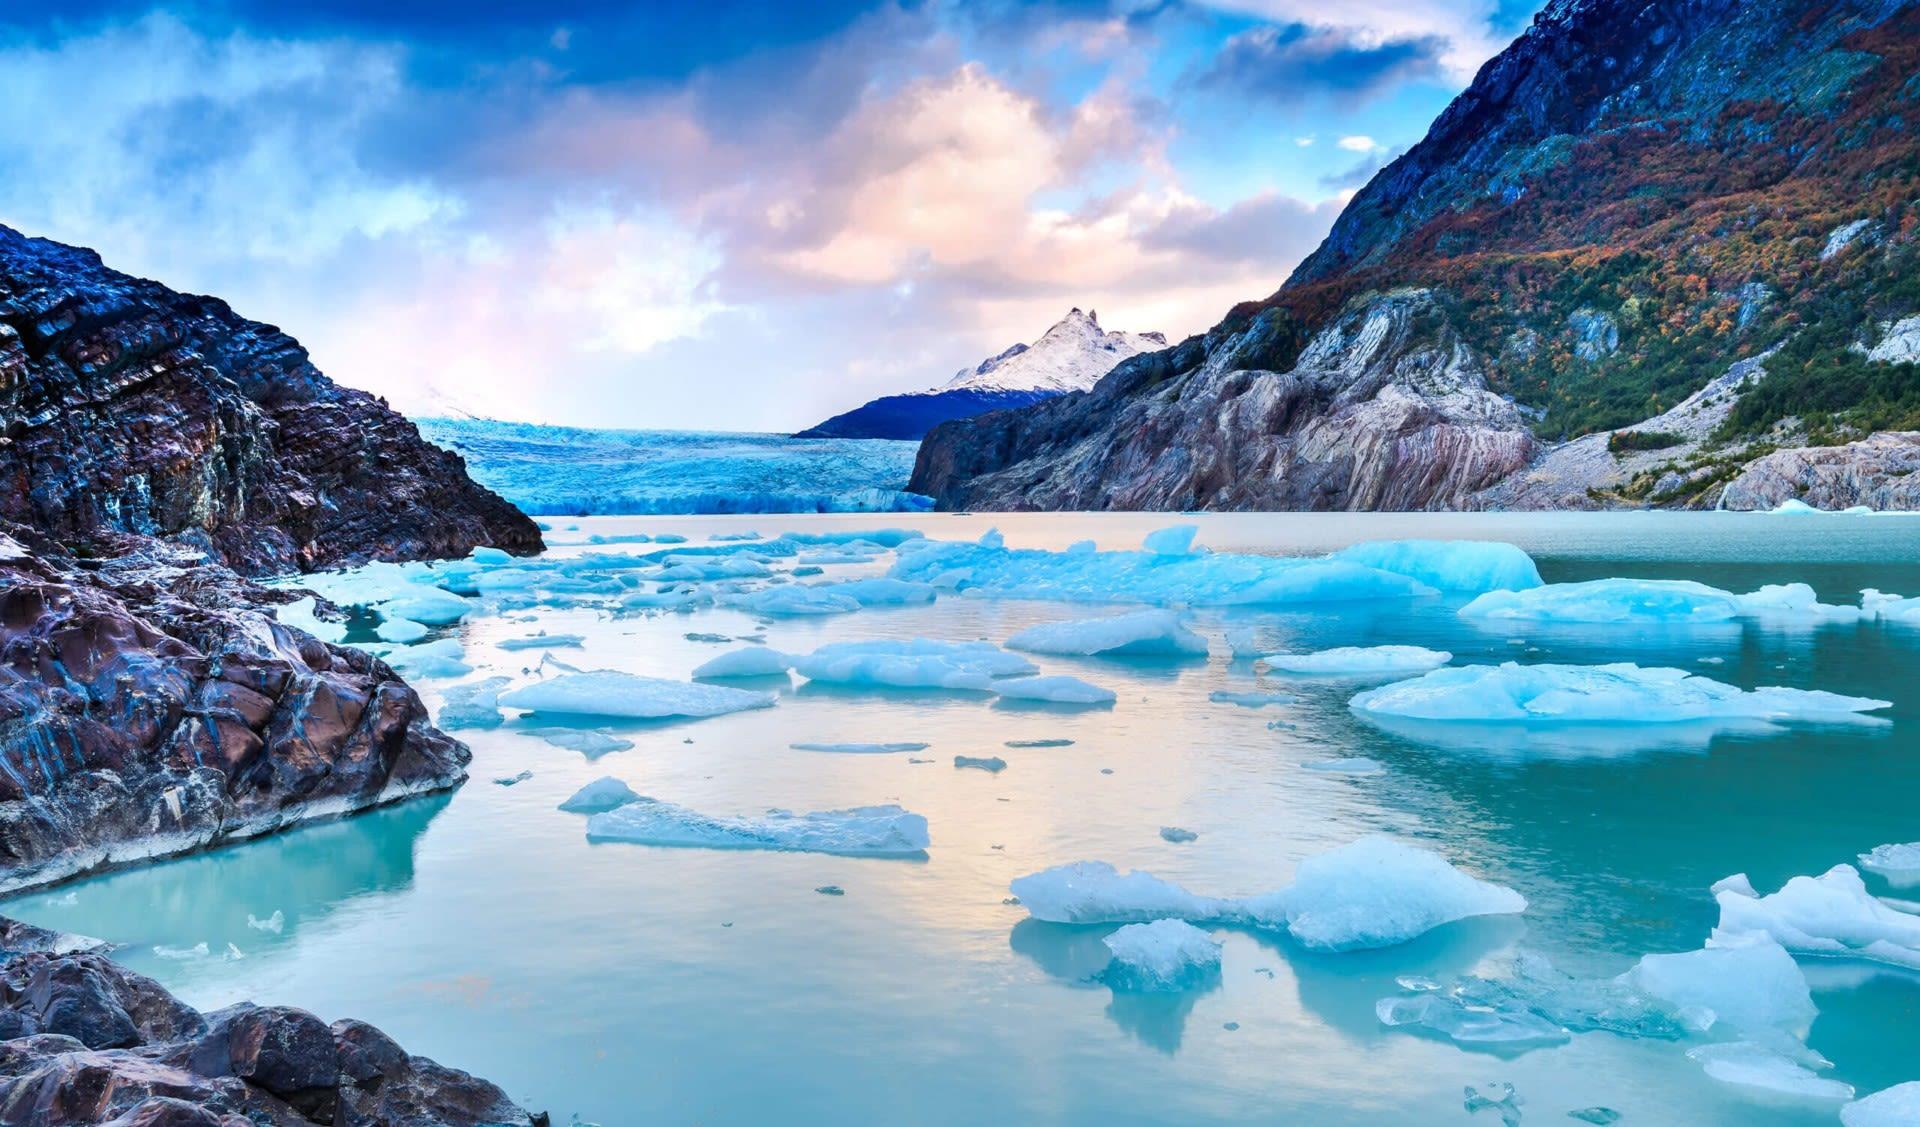 Patagonia glacier and water